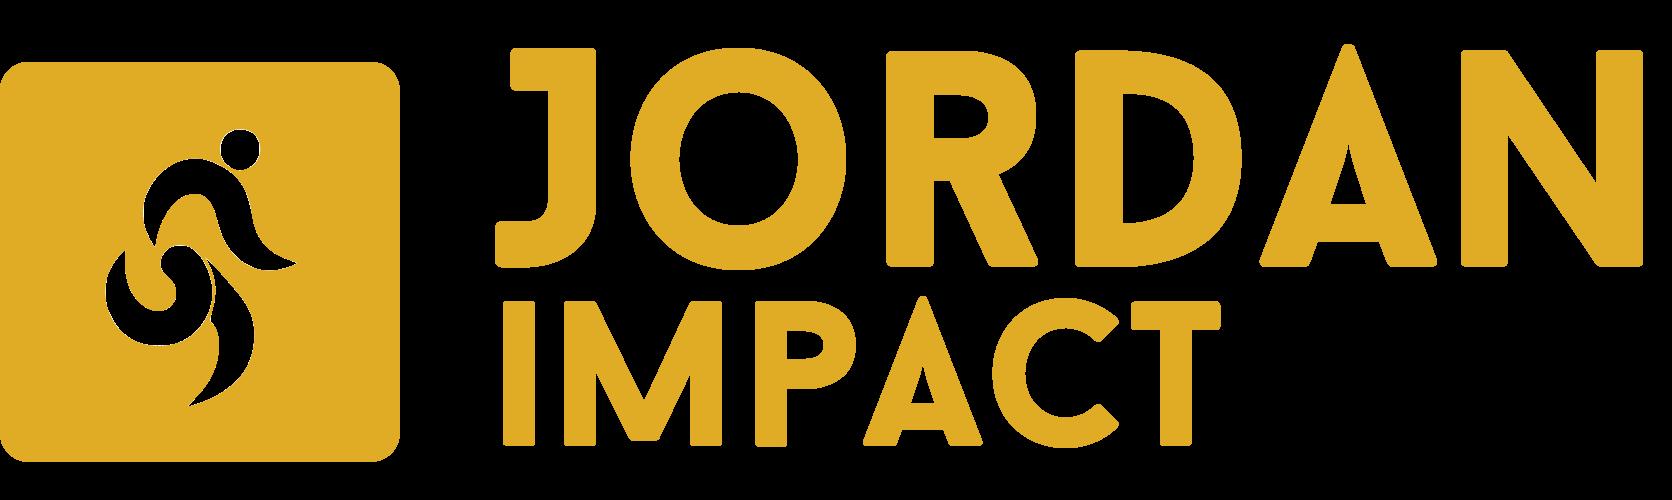 Jordan Impact Marathon